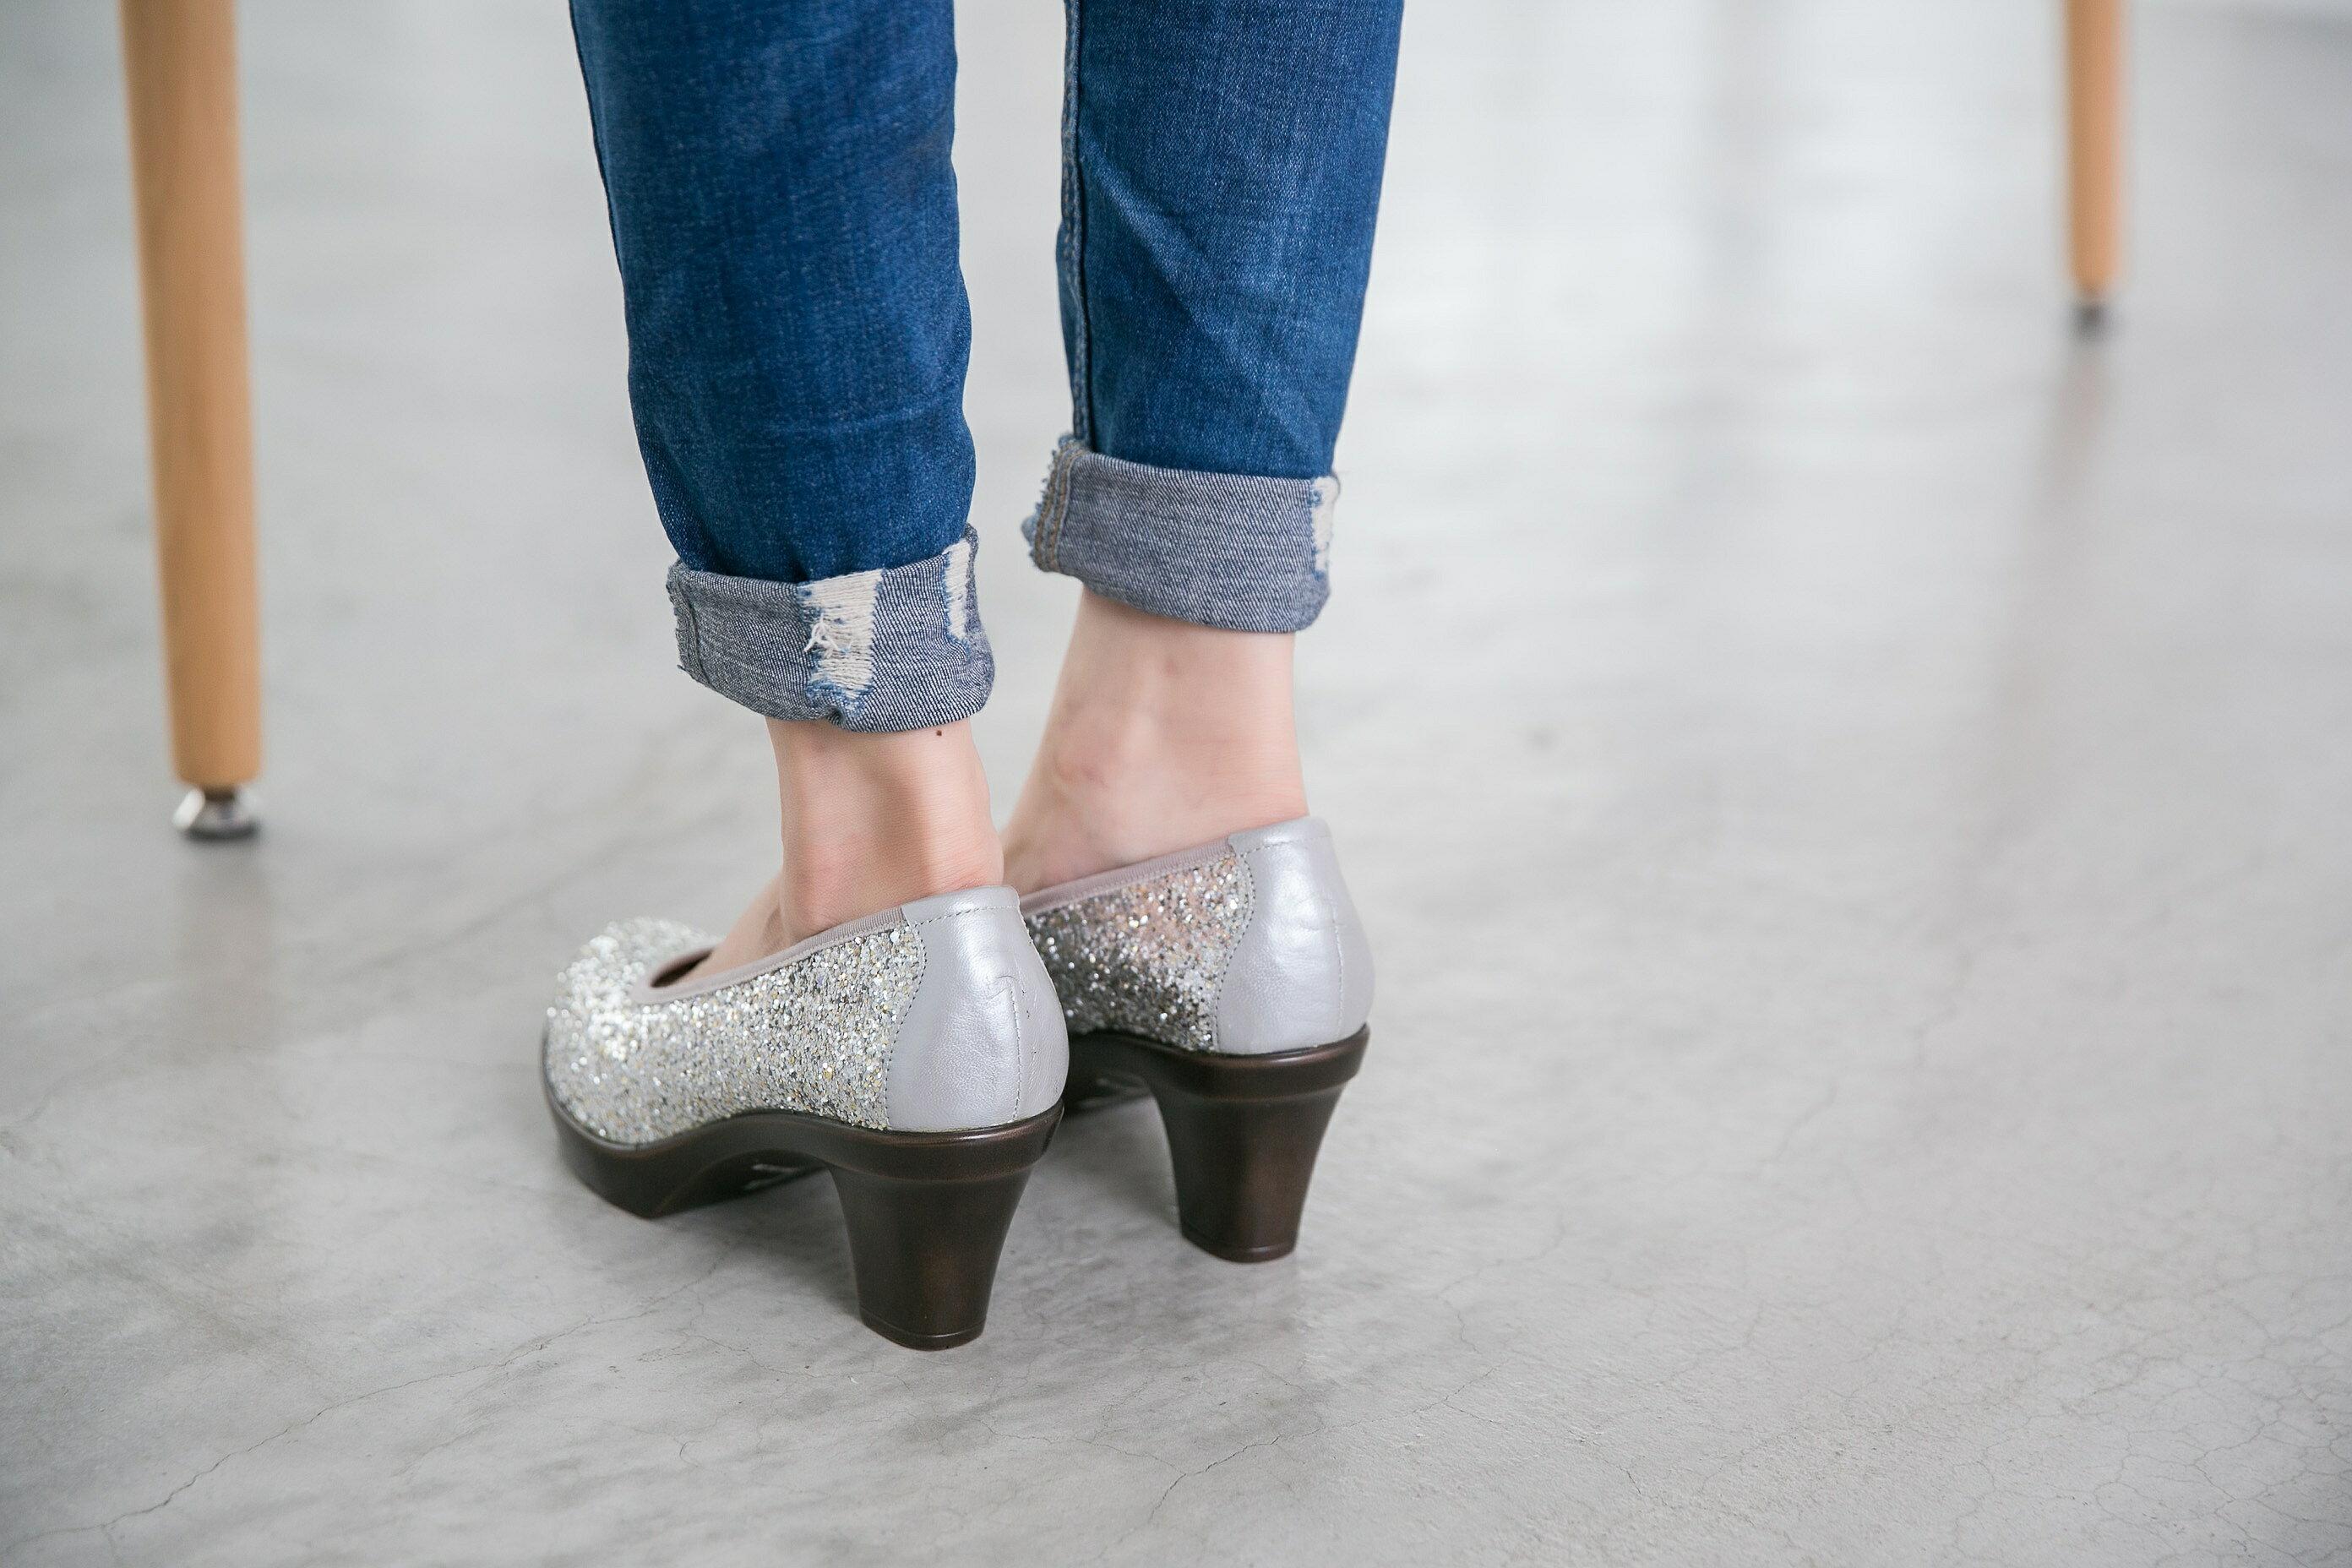 Aimez La Vie 舒適跟鞋 閃閃亮鑽約會Party厚底中跟鞋 3